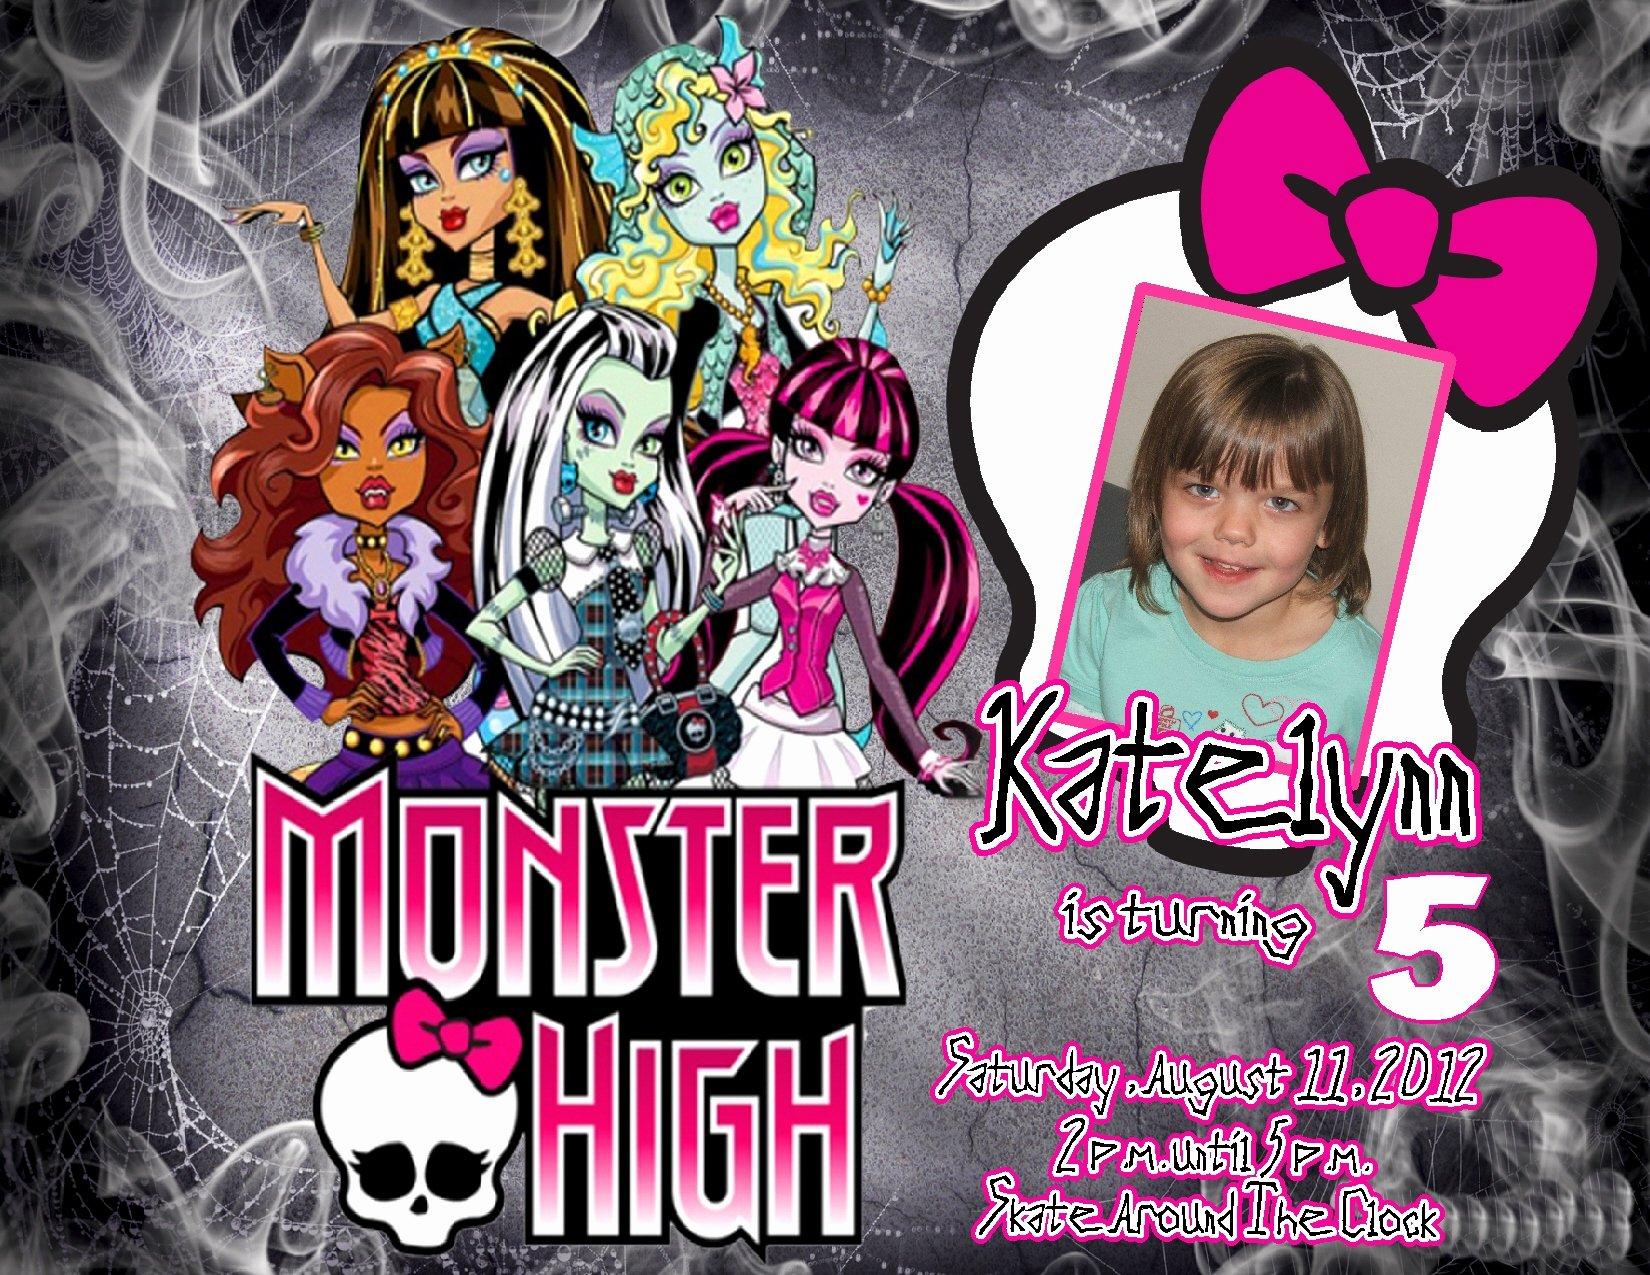 Monster High Invitations Templates Elegant All Gang Monster High Ideas – Free Printable Birthday